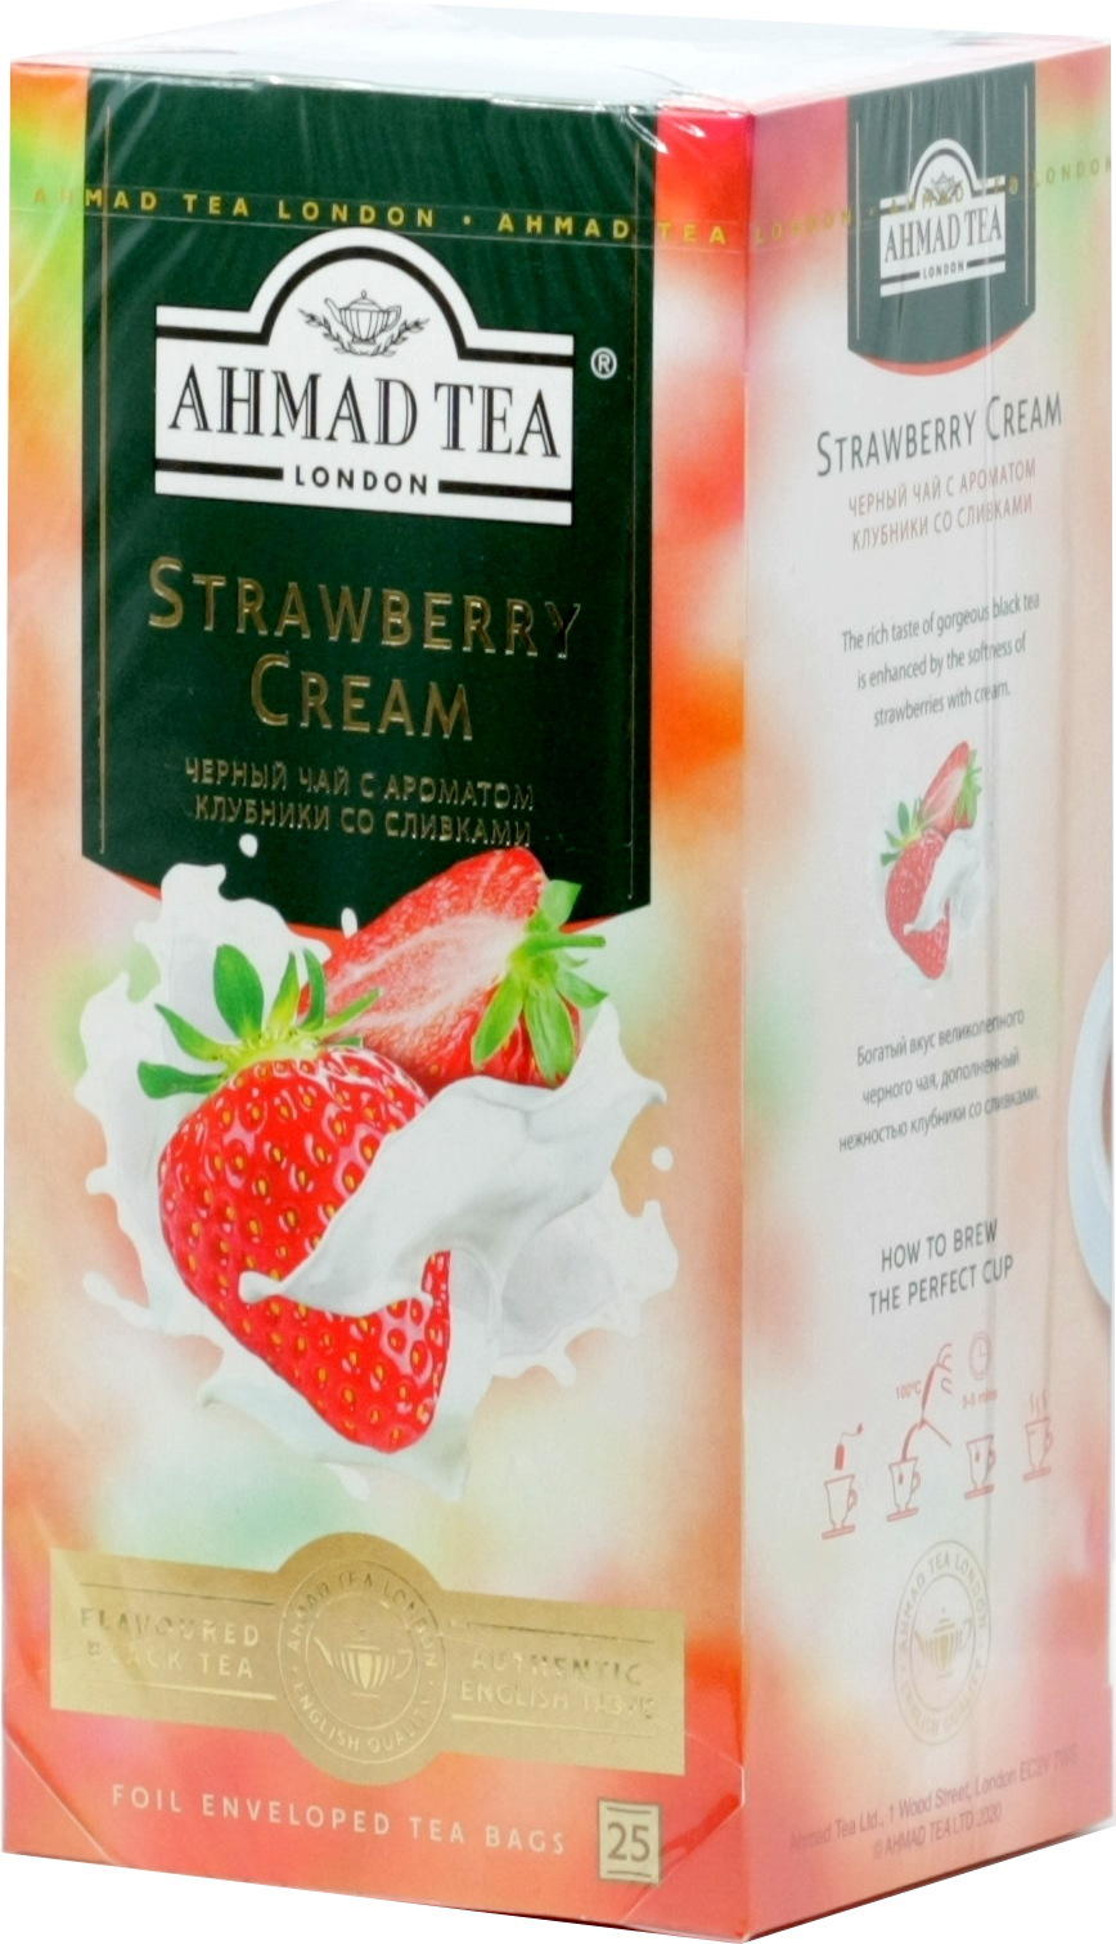 AHMAD. Strawberry Cream (клубника, сливки) карт.пачка, 25 пак.